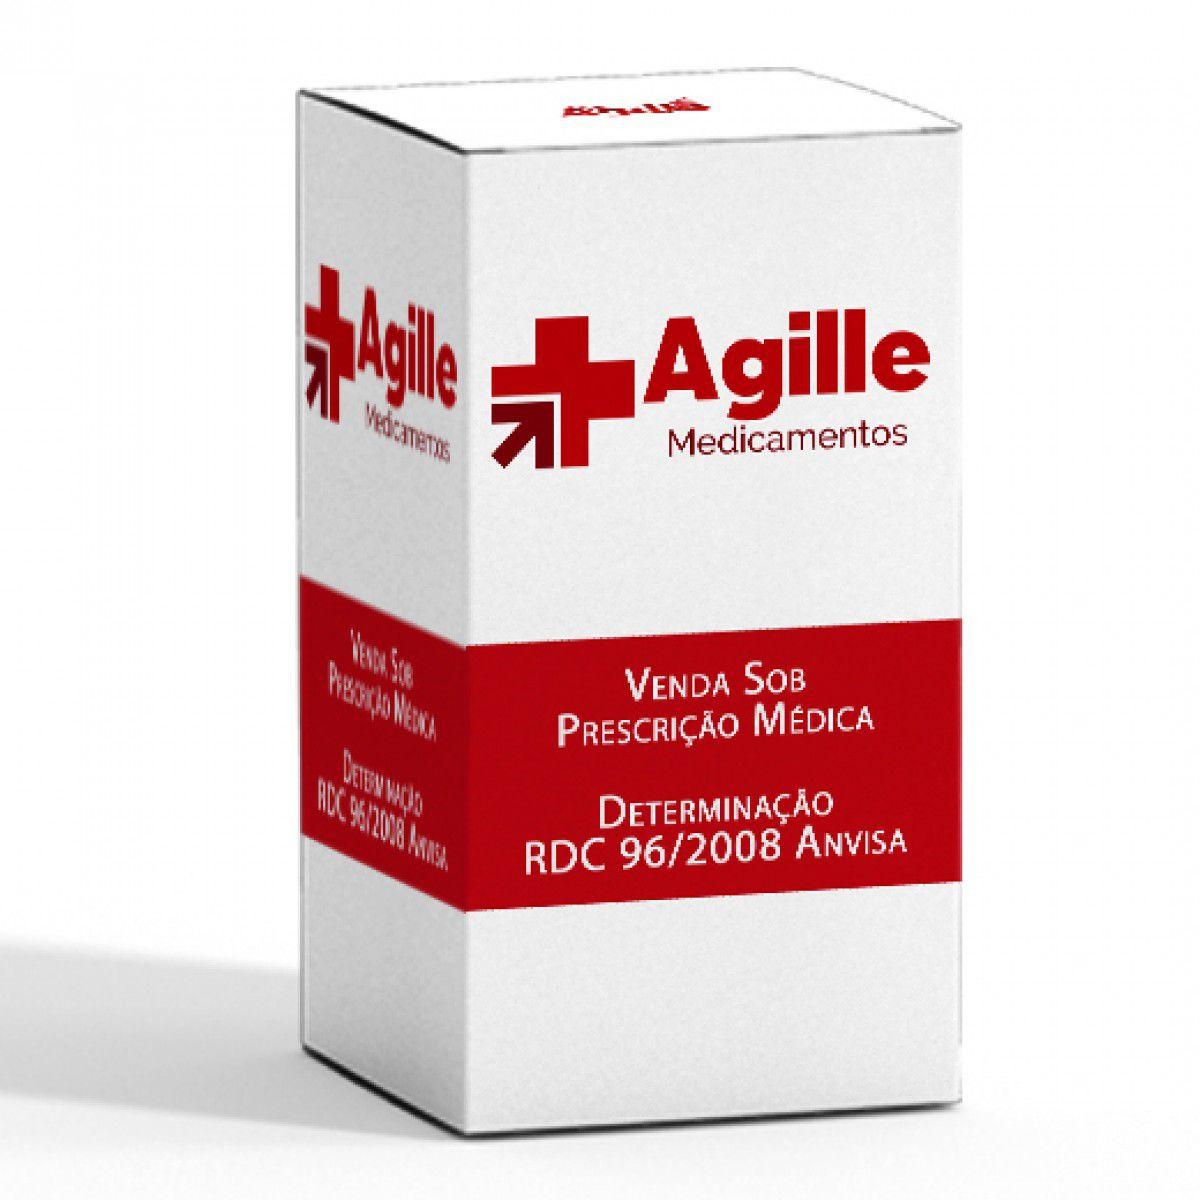 VORICONAZOL 50MG CX 14 COMP REV  - Agille Speciality